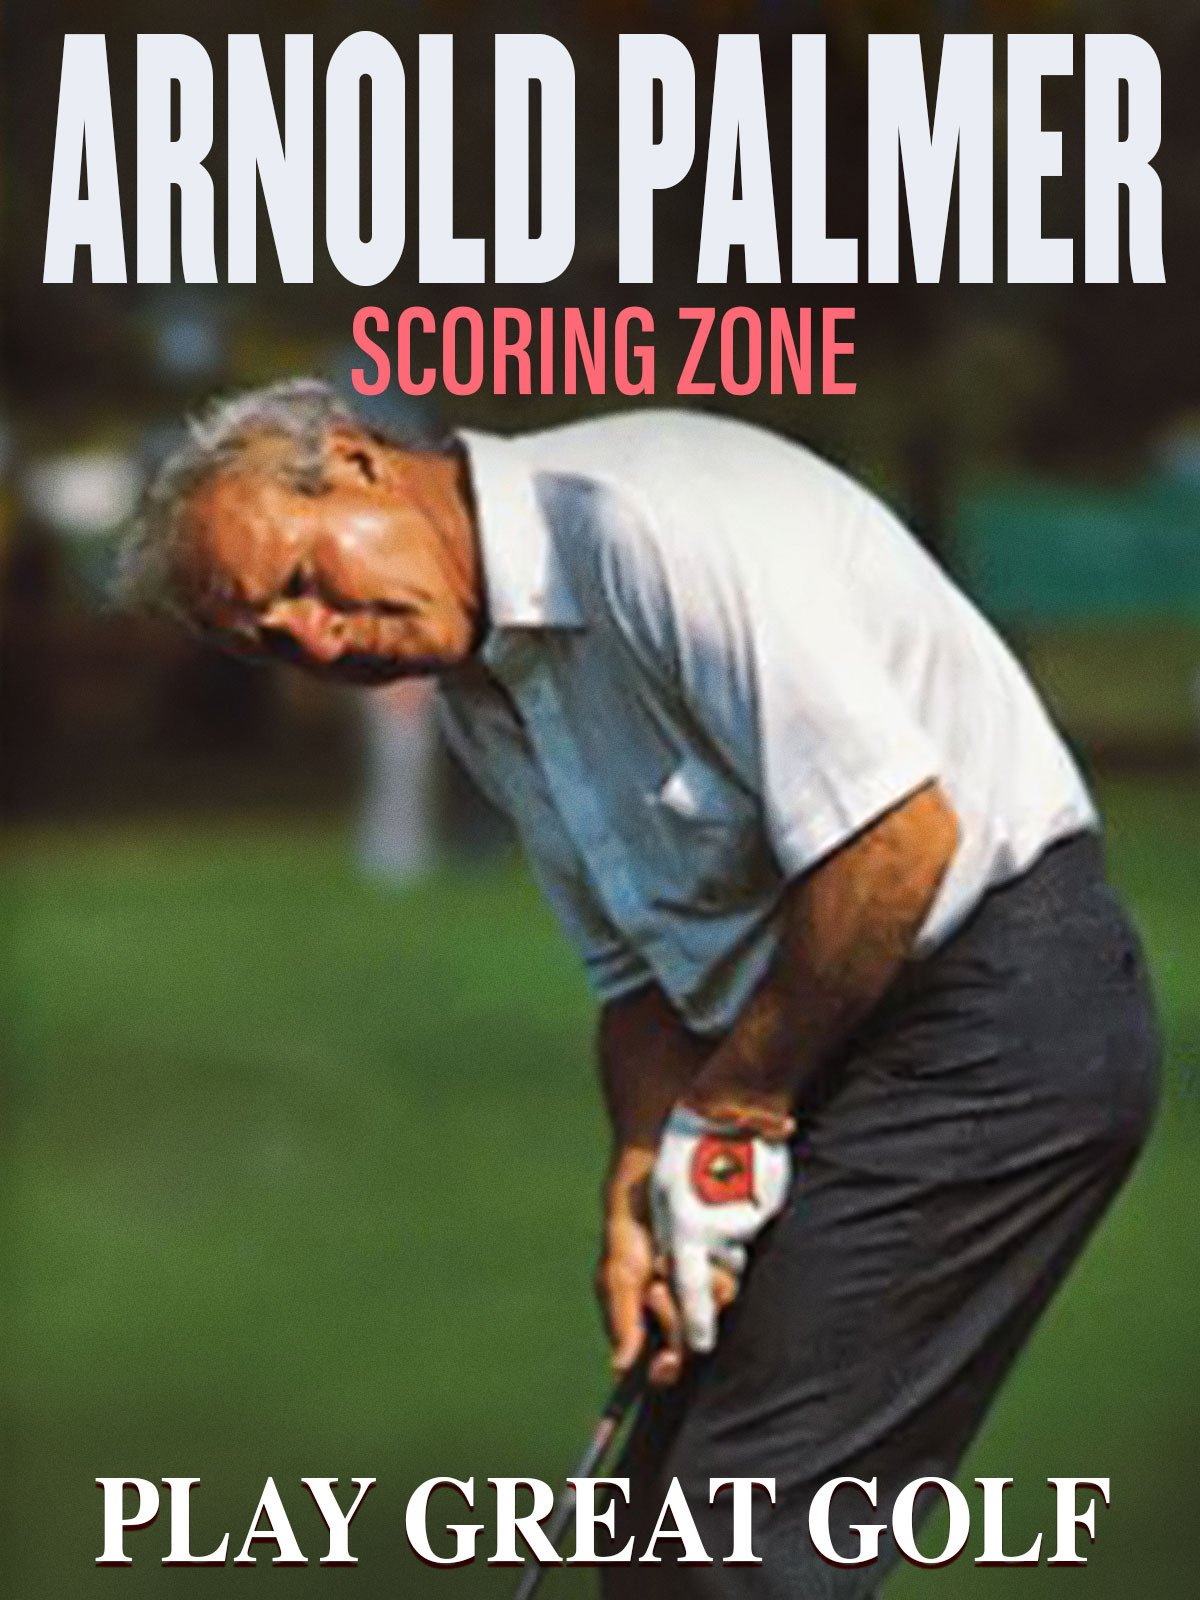 Arnold Palmer: The Scoring Zone on Amazon Prime Video UK